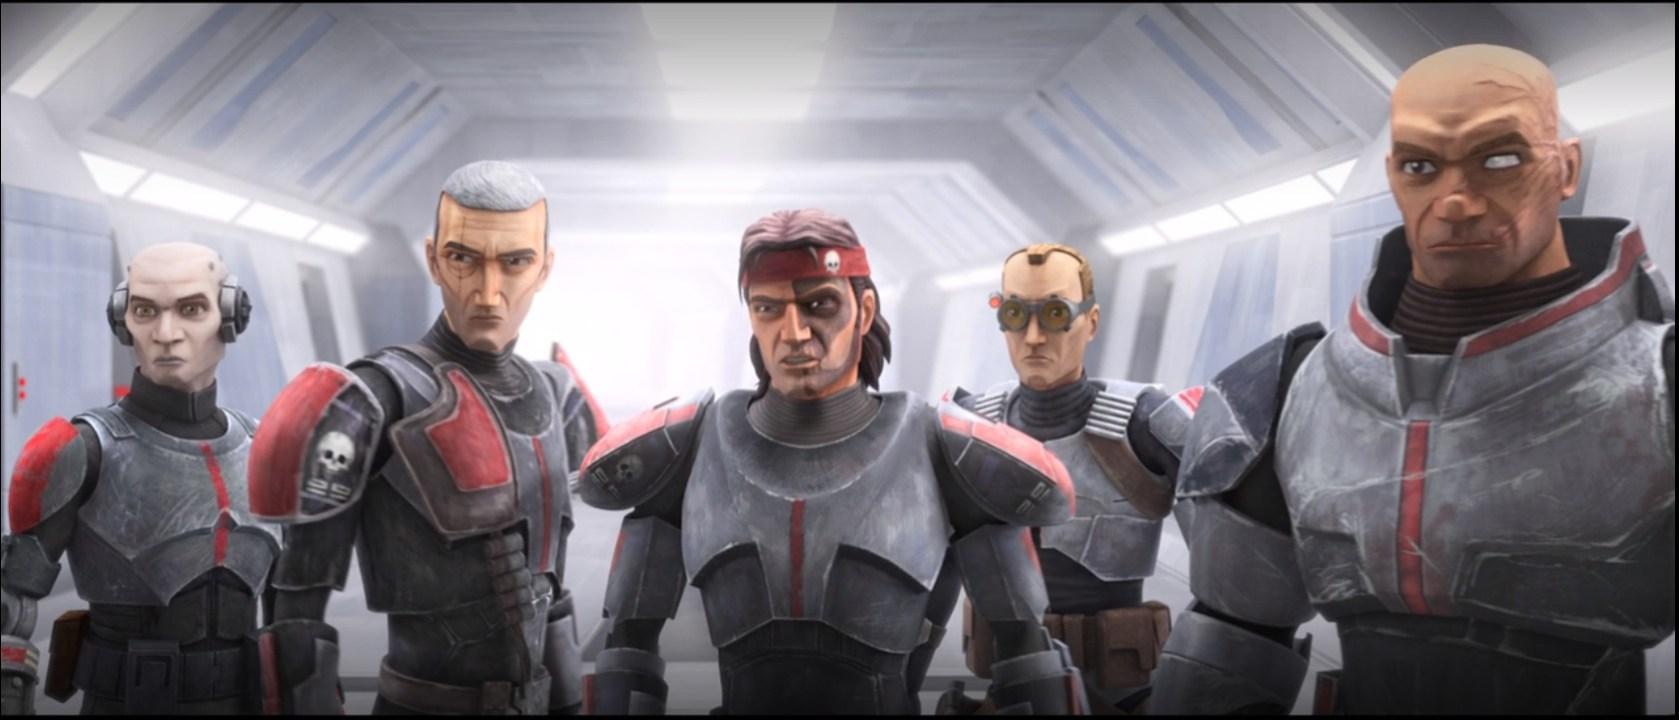 Star Wars: The Bad Batch Premiere-The Bad Batch